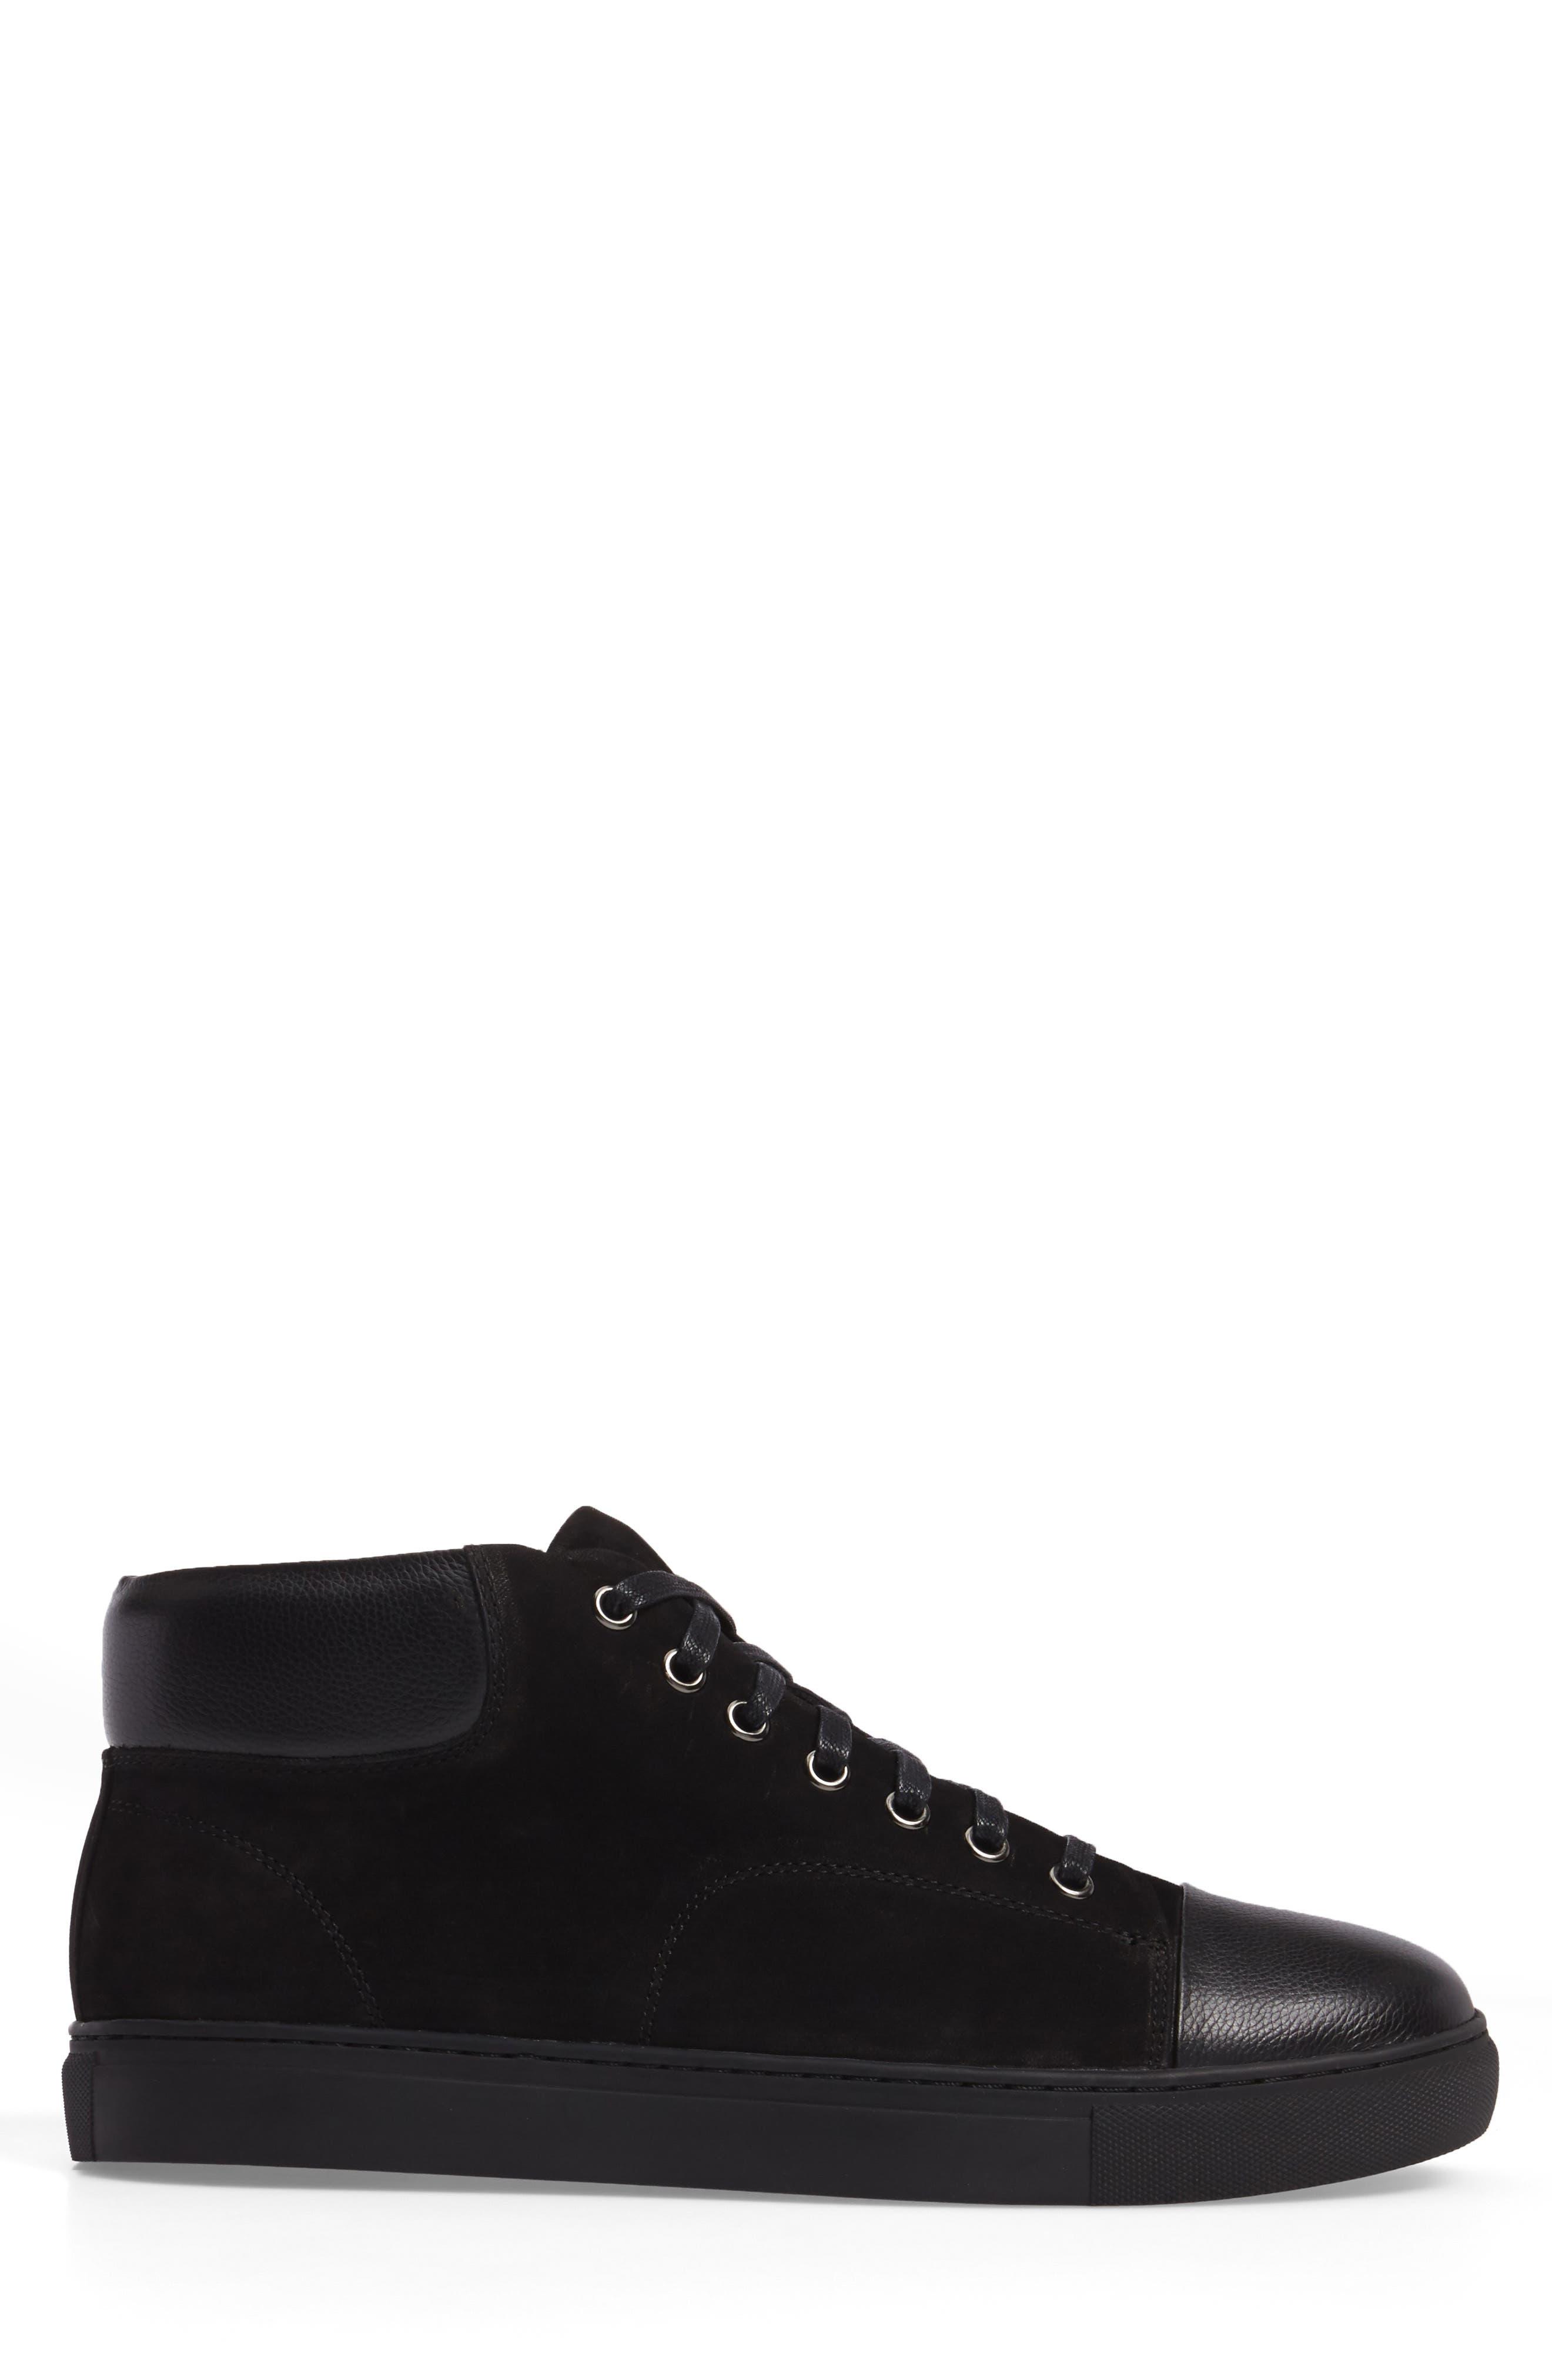 Landseer Sneaker,                             Alternate thumbnail 3, color,                             001